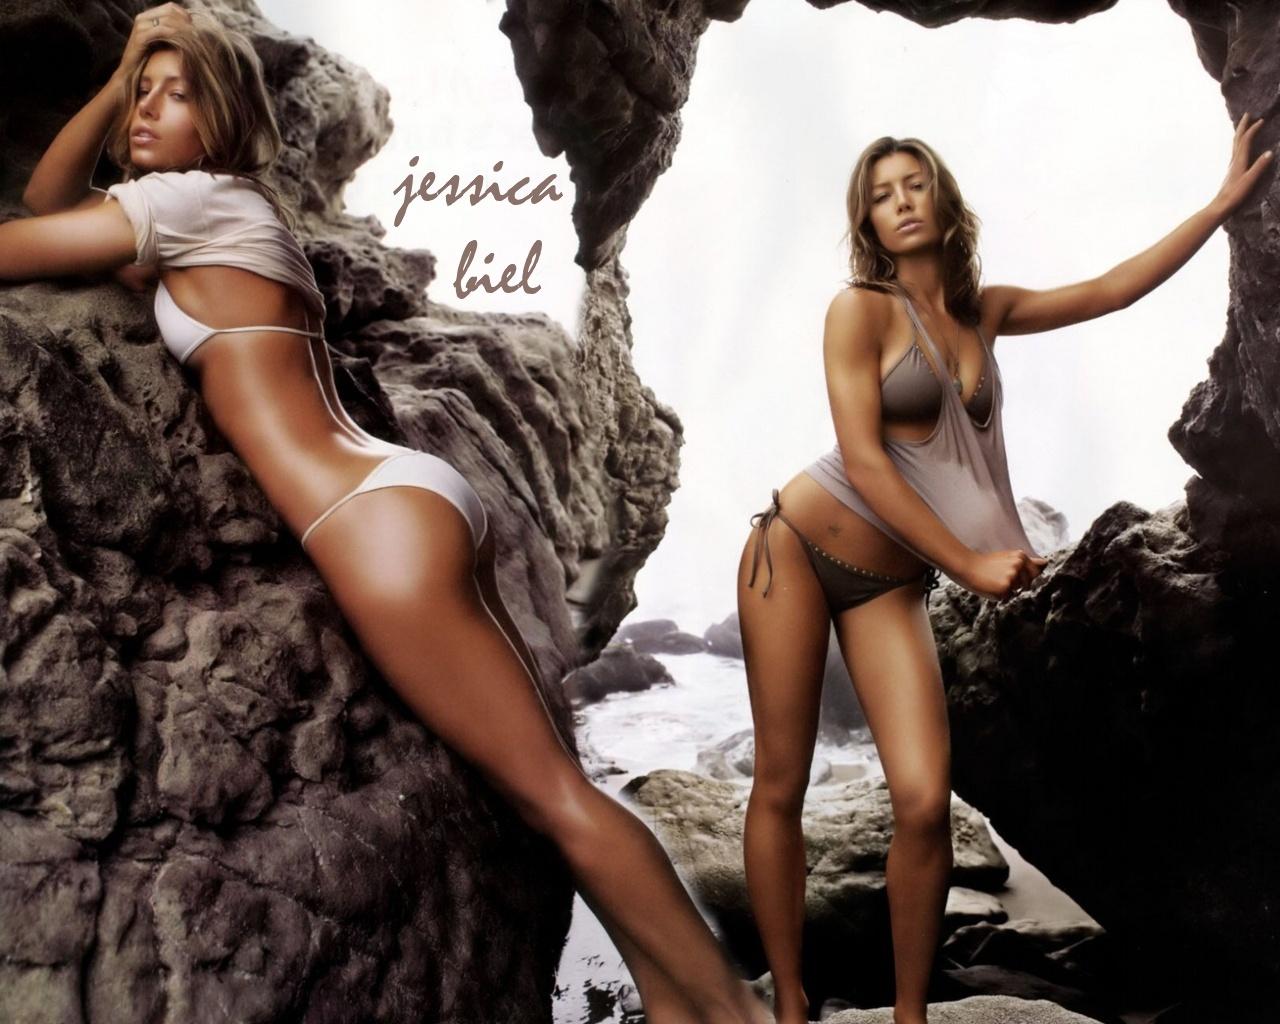 http://2.bp.blogspot.com/-ibKFkFrhm0s/TqffZ9EZjuI/AAAAAAAAALA/l1CyMOqOyOY/s1600/Jessica%2BBiel%2BWorkout-Wallpaper.jpg